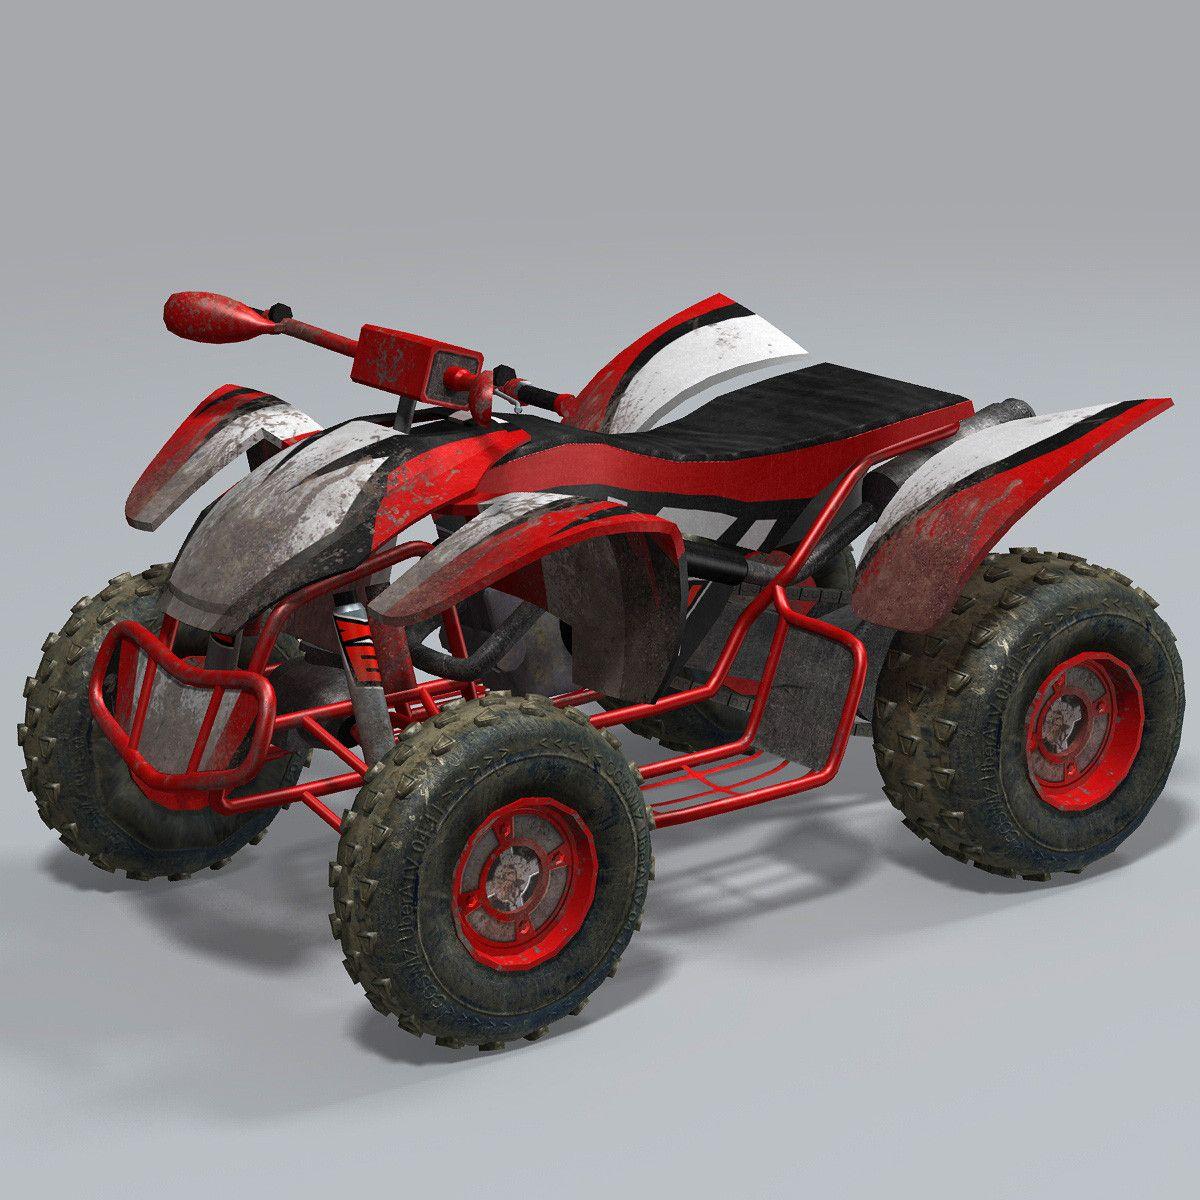 Max Realtime Quad Bike Atv 3d Model 3d Modeling Pinterest